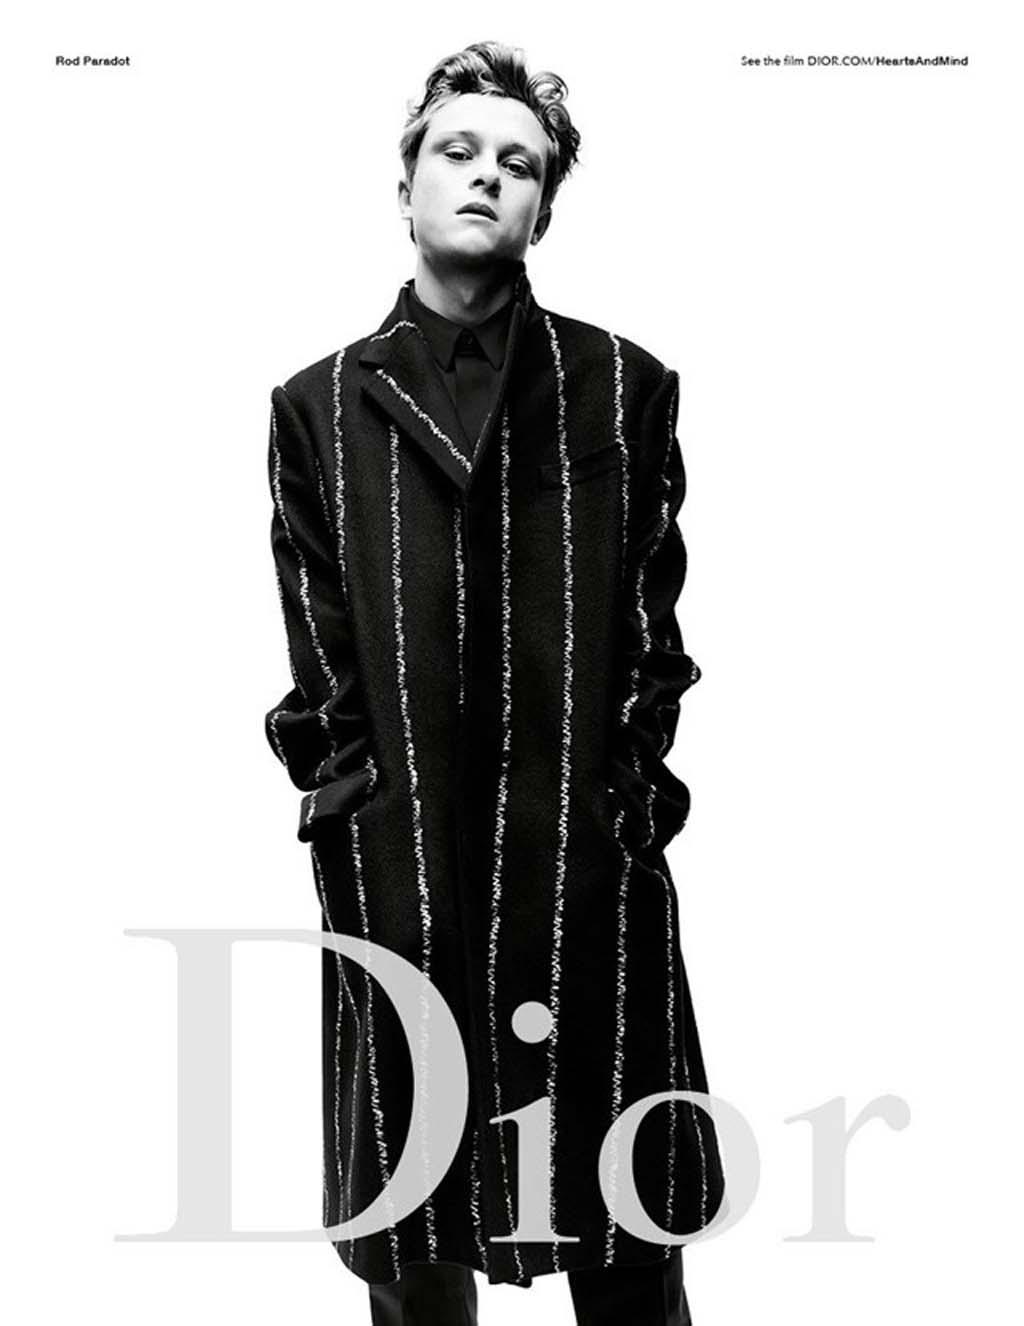 Dior-Homme-aw16-campaign-slashitmag-fashion-ad-6